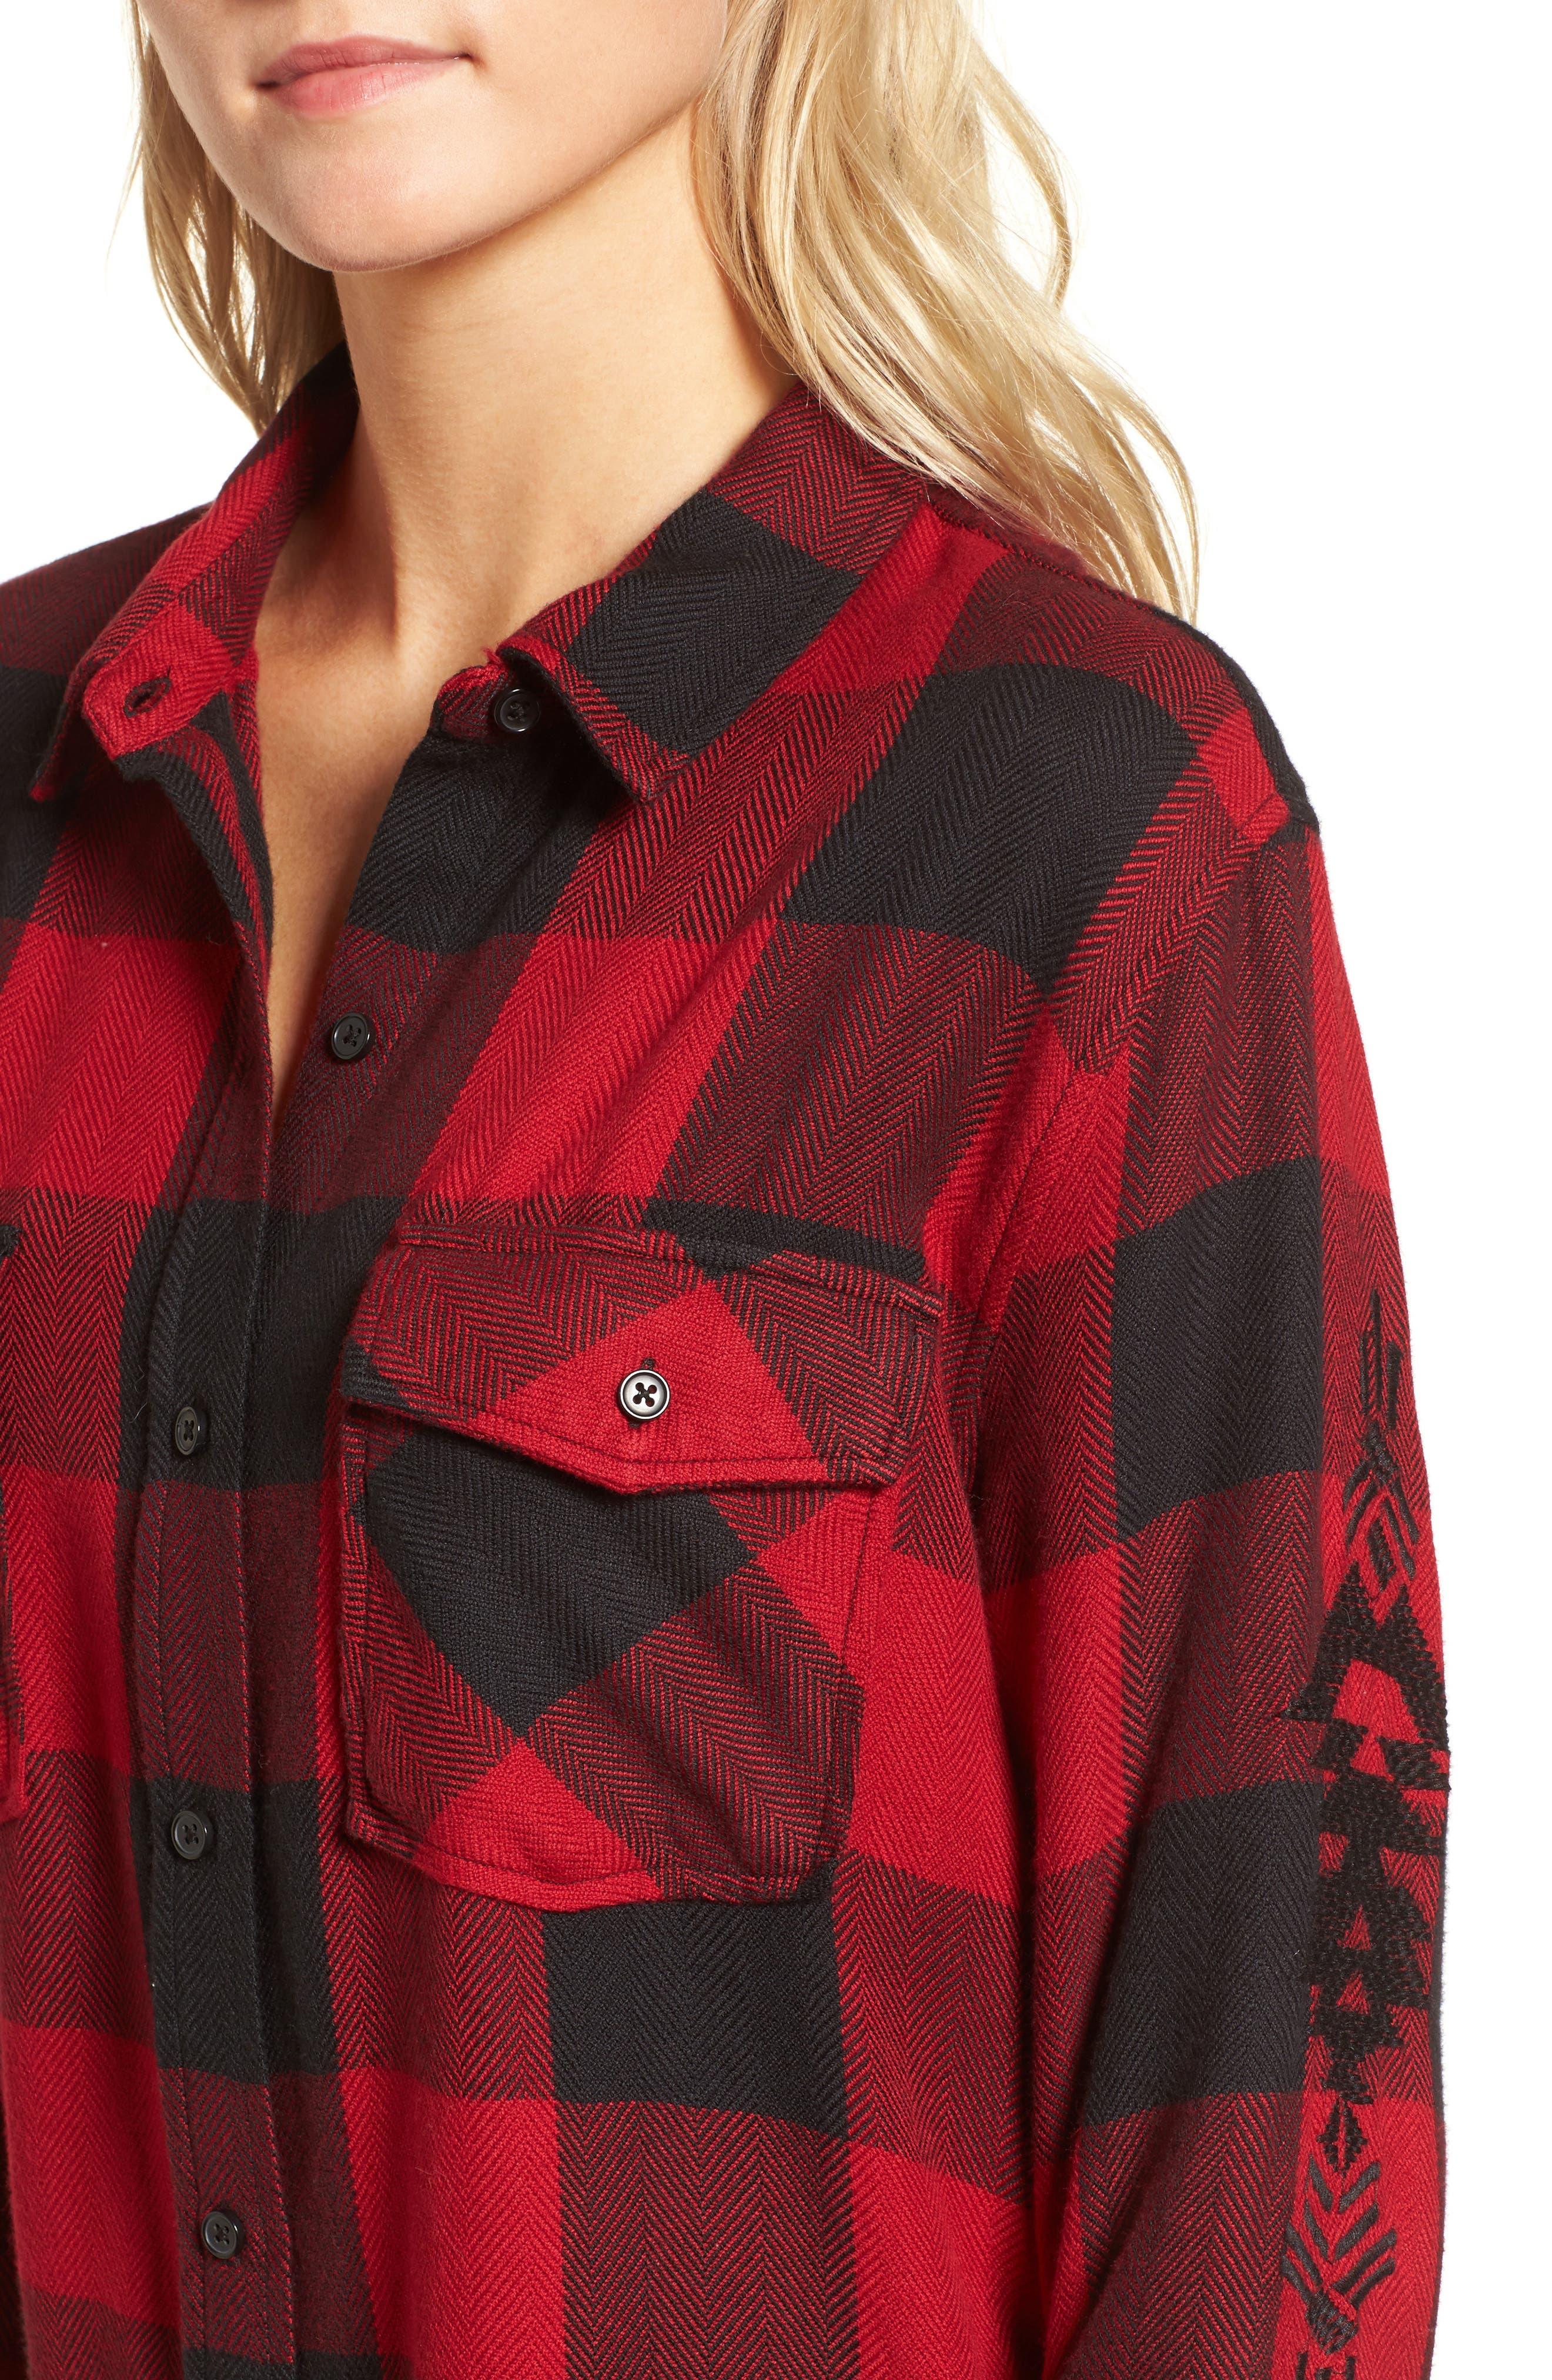 Larsson Embroidered Flannel Shirt,                             Alternate thumbnail 5, color,                             Crimson Jet